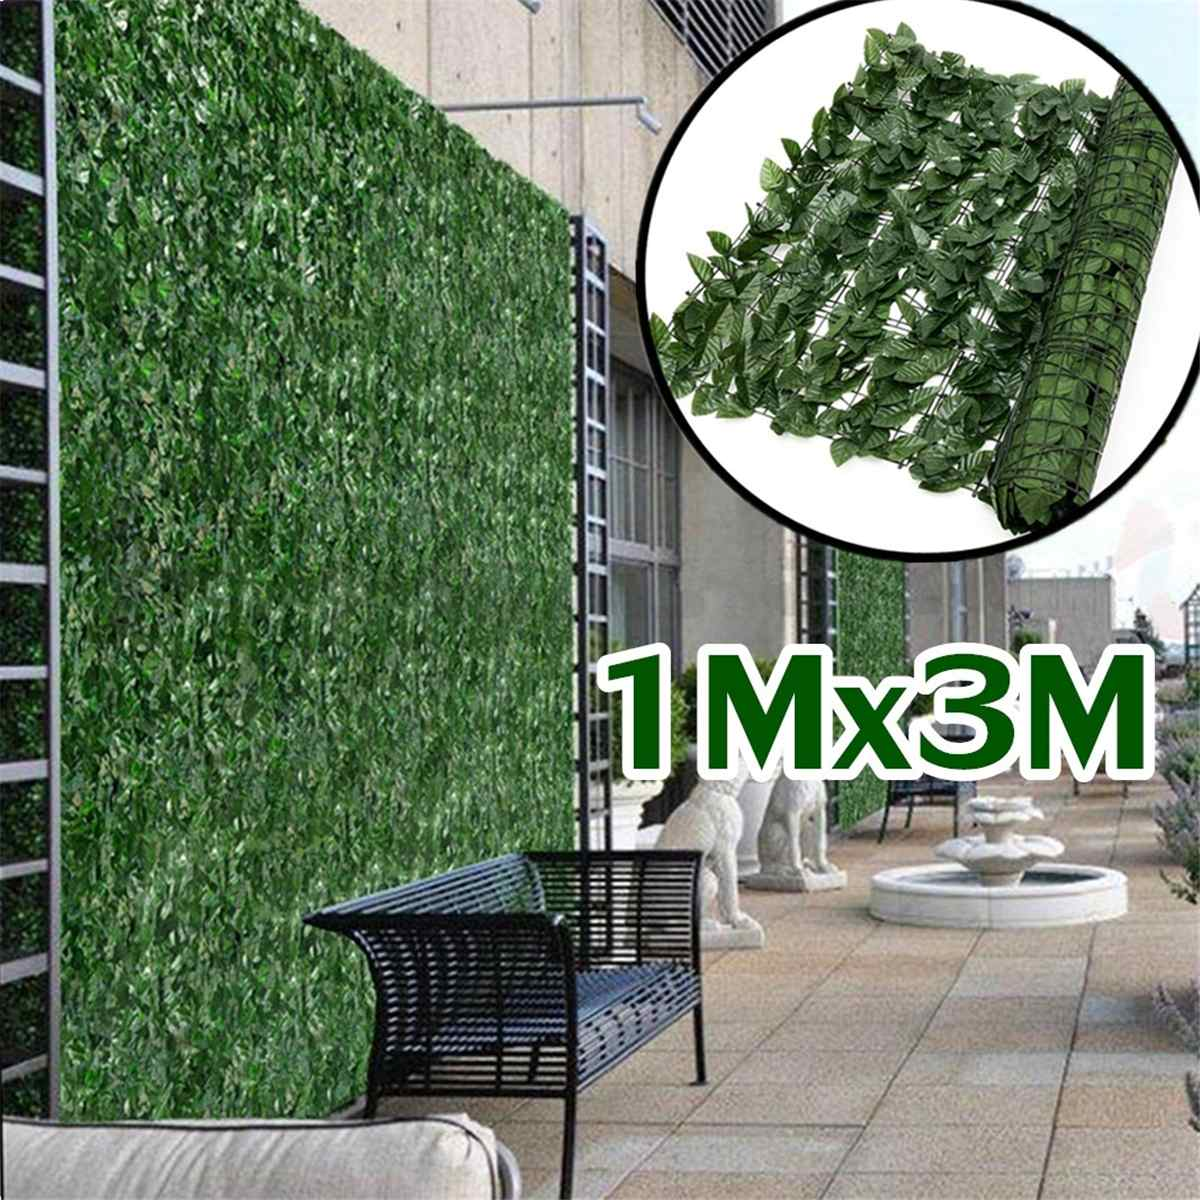 Artificial Plant Wall Lawn Boxwood Hedge Garden Backyard Home Decor Simulation Grass Turf Rug Lawn O